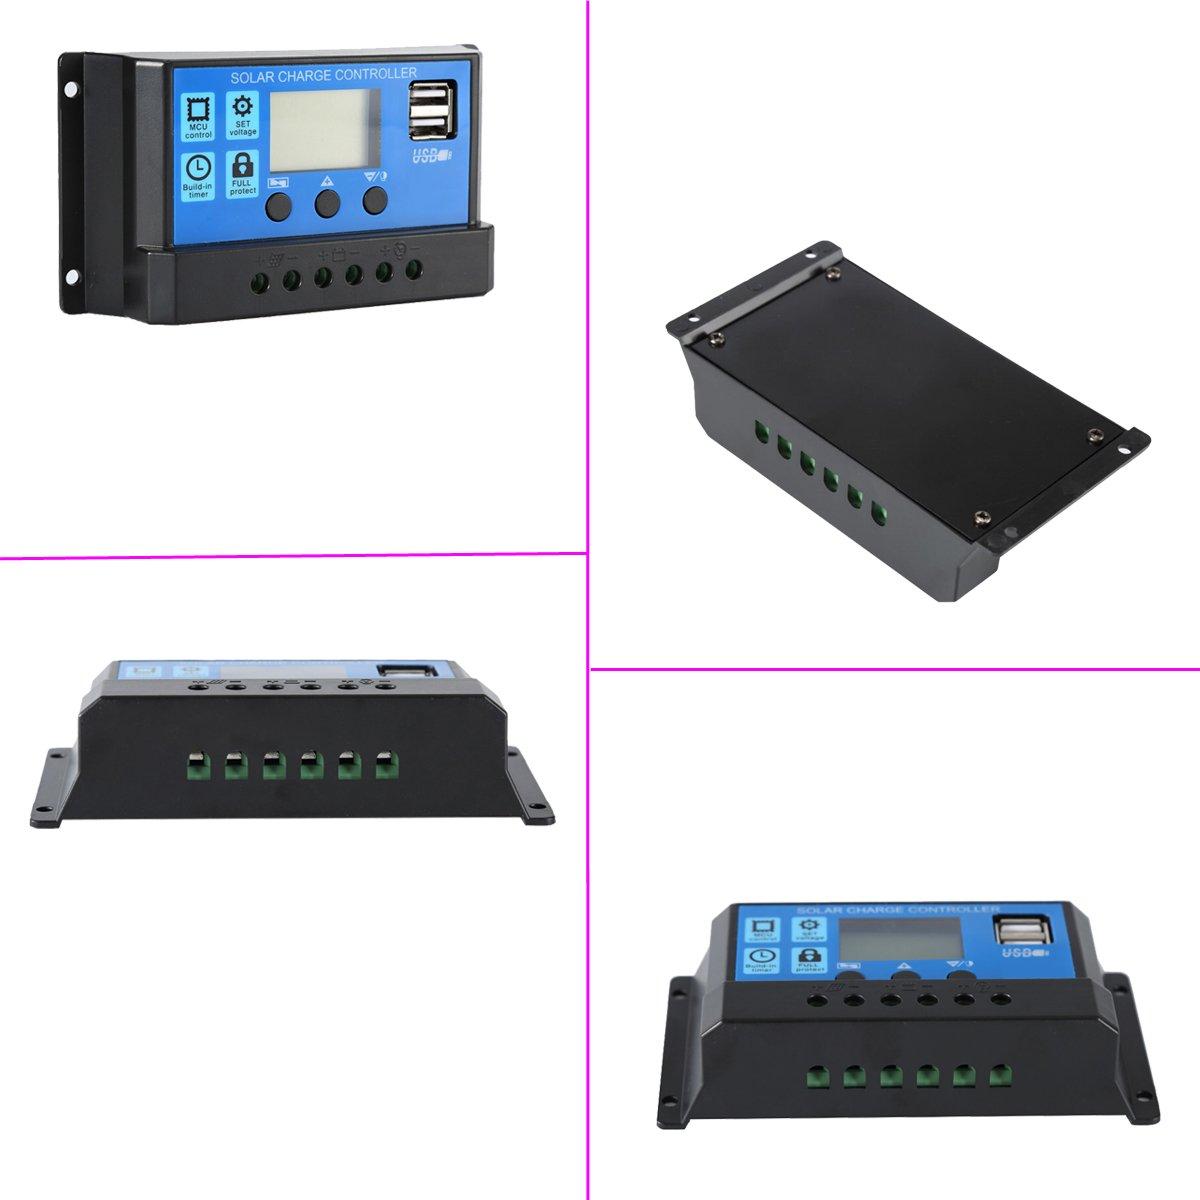 Pwm Solar Panel Charge Controller 12v 24v Voltage Controllersolar Generator 220v Portablesolar Regulator 10a By Easun Power Usb Port Lcd Garden Outdoor